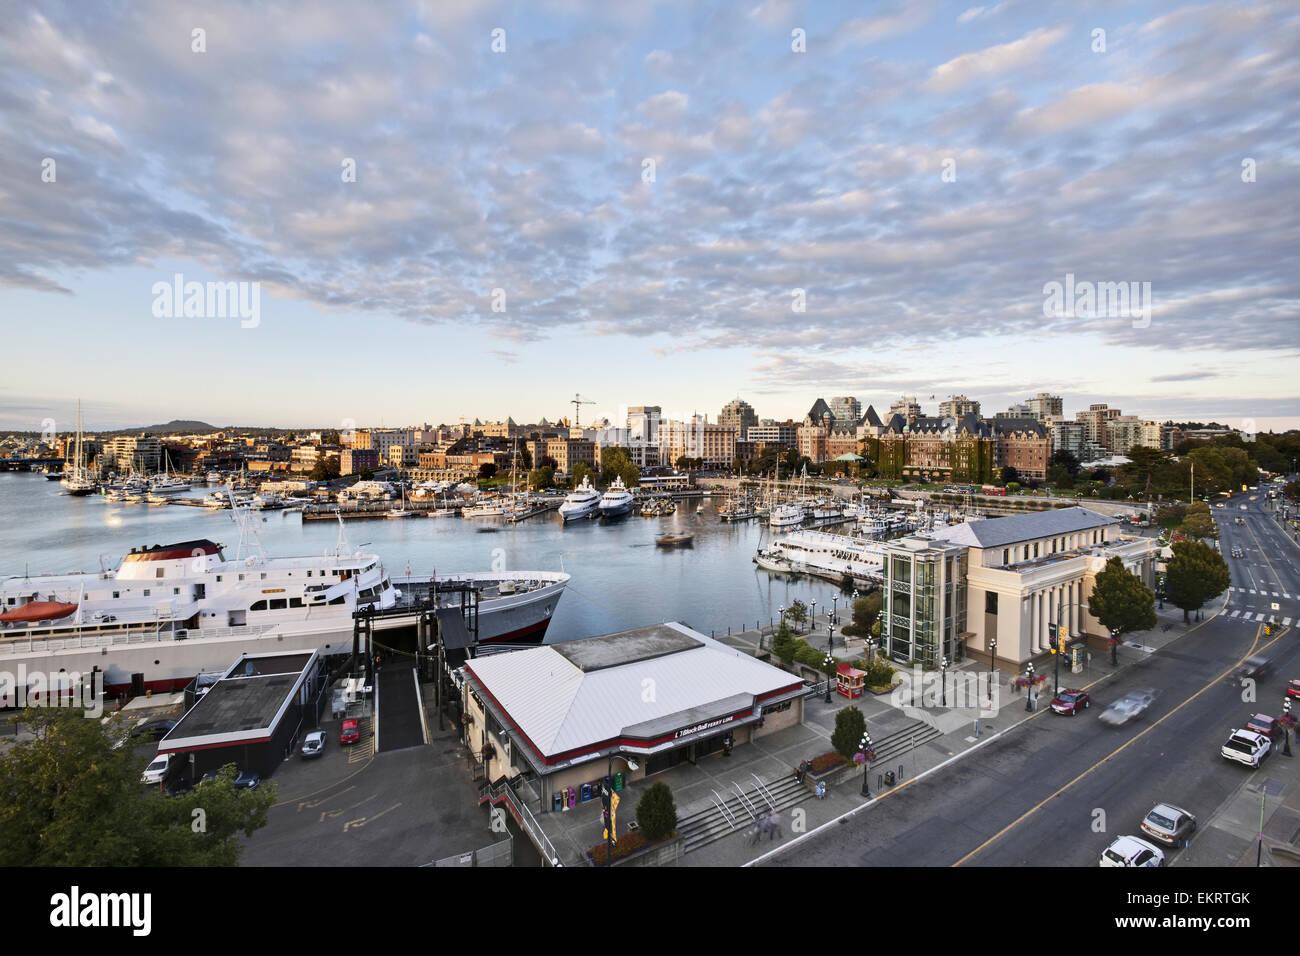 Ferry in Victoria Harbour; Victoria, Vancouver Island, Canada - Stock Image